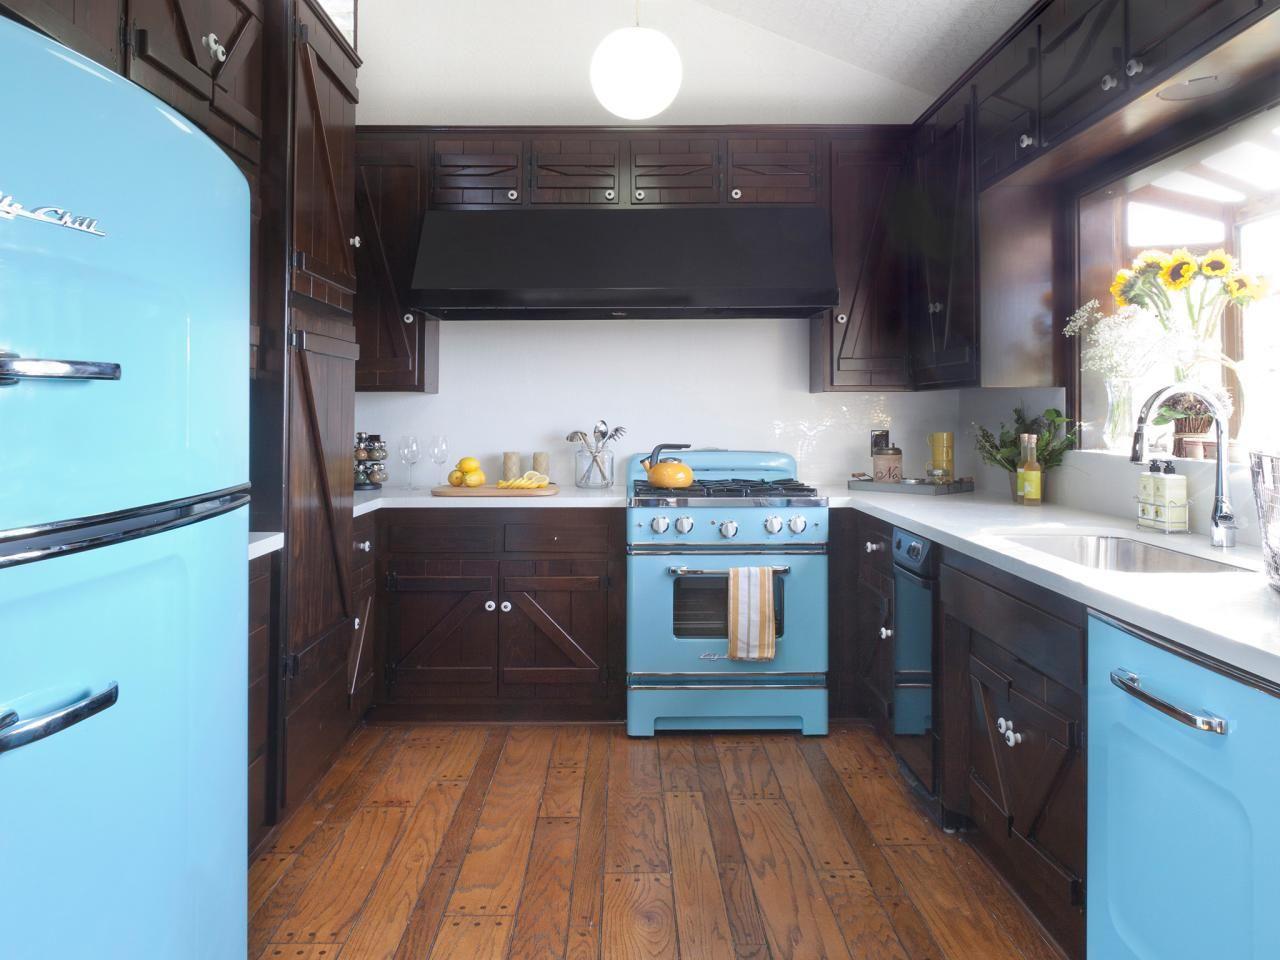 Italian Kitchen Design Pictures Ideas Tips From Hgtv Eclectic Kitchen Timeless Kitchen Kitchen Design Small